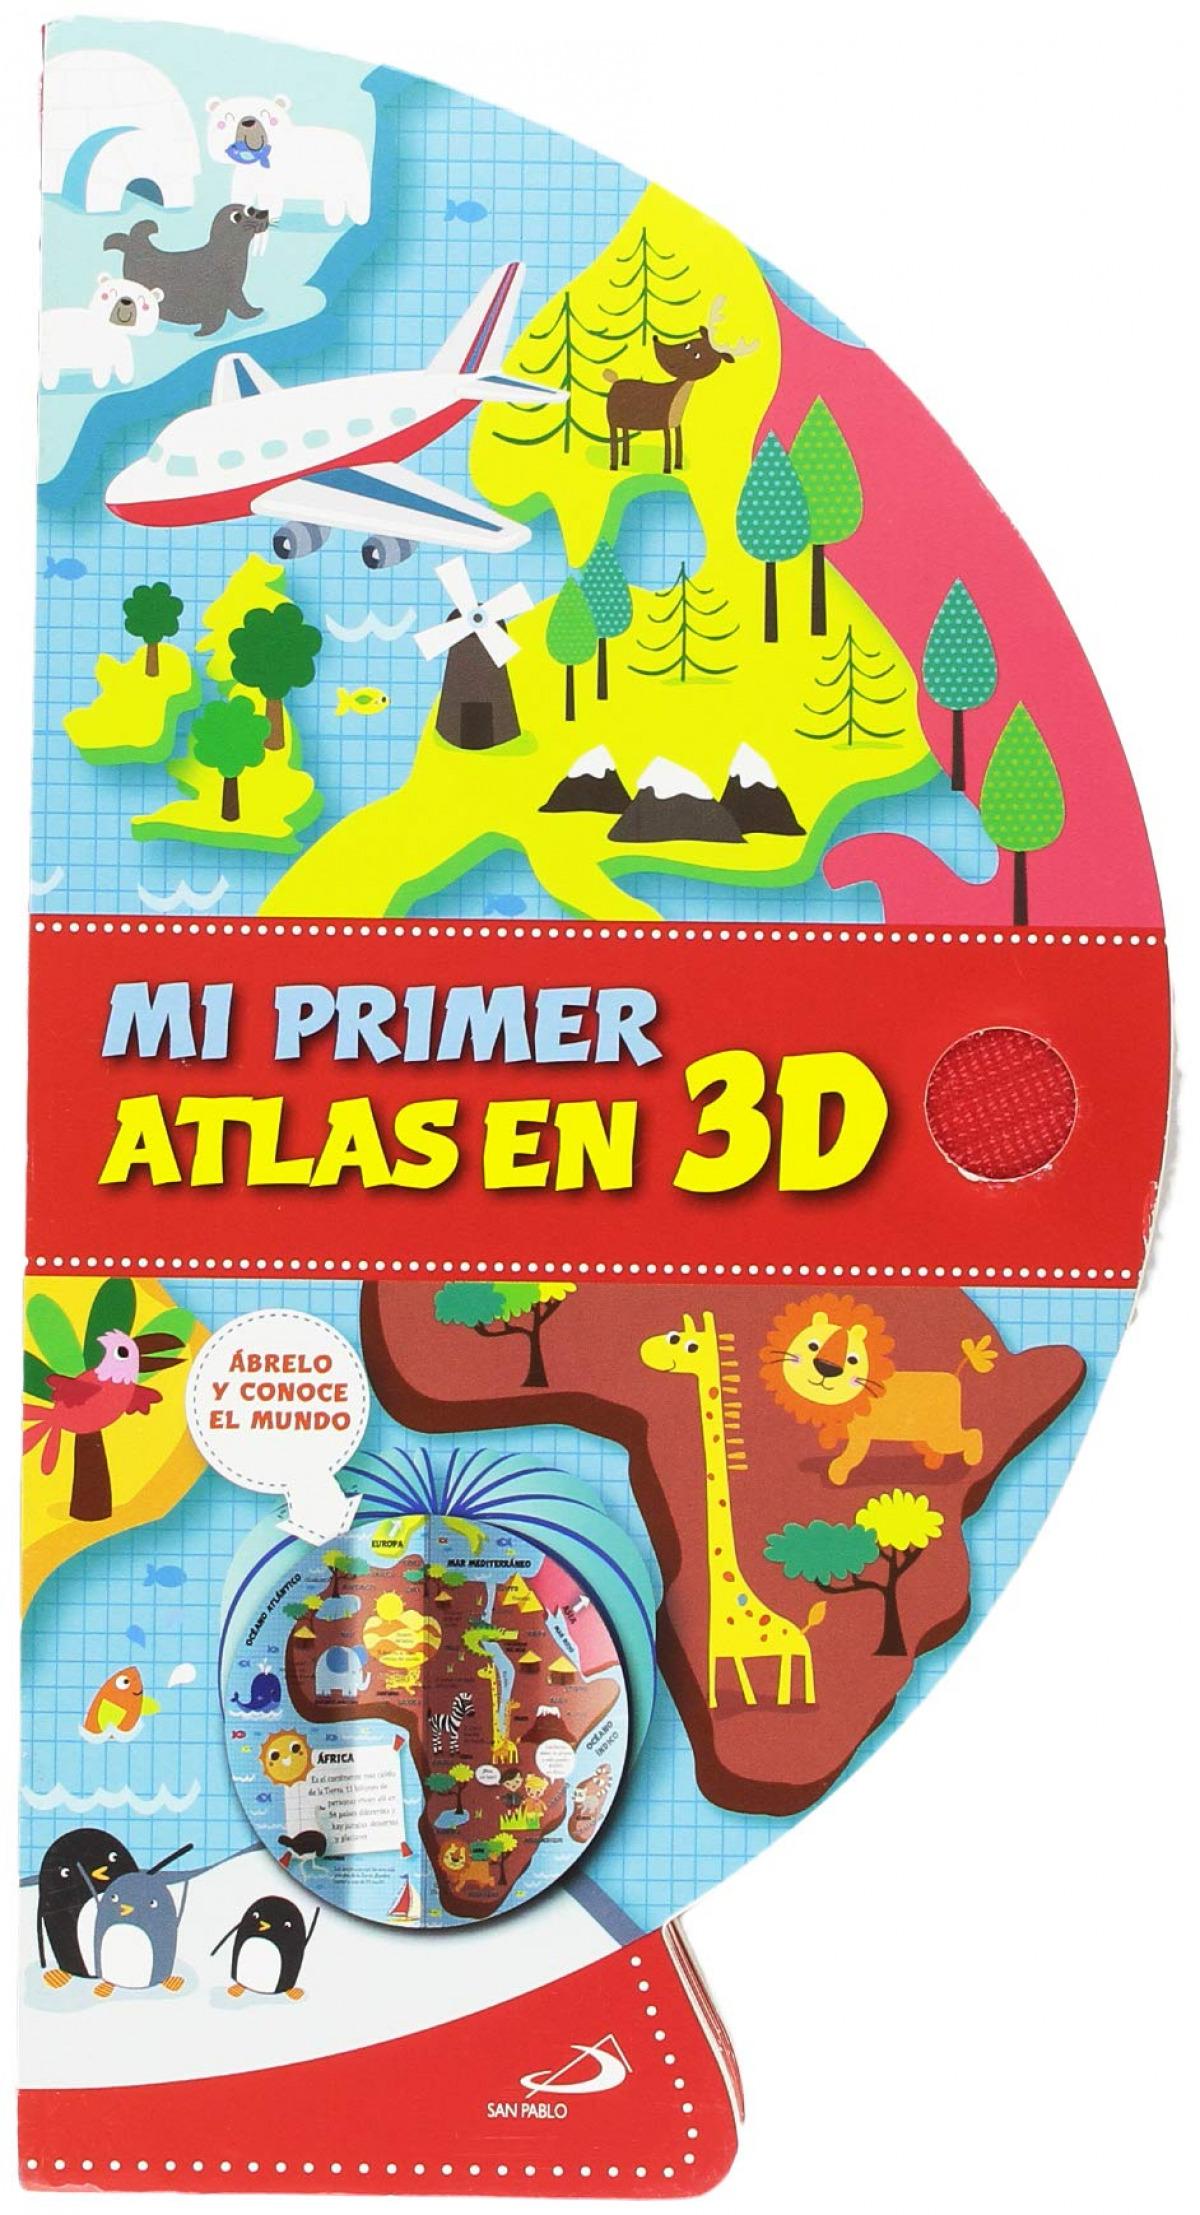 MI PRIMER ATLAS EN 3D 9788428555067